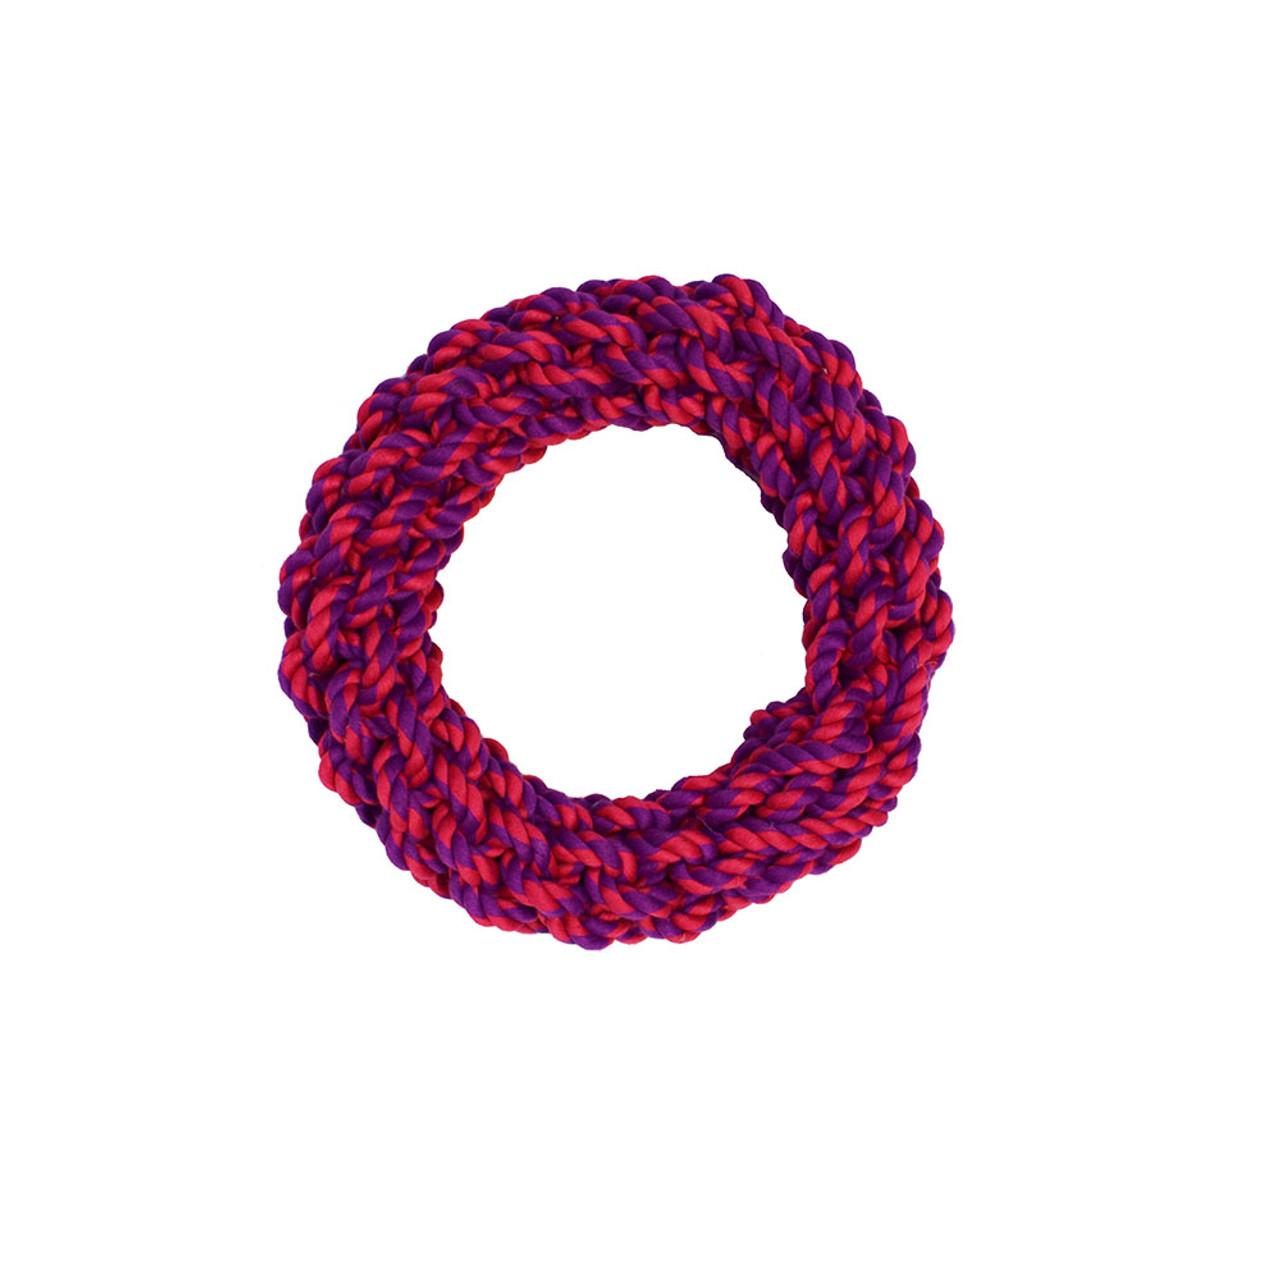 Amazing Pet Ring Rope Dog Toy - Purple & Magenta